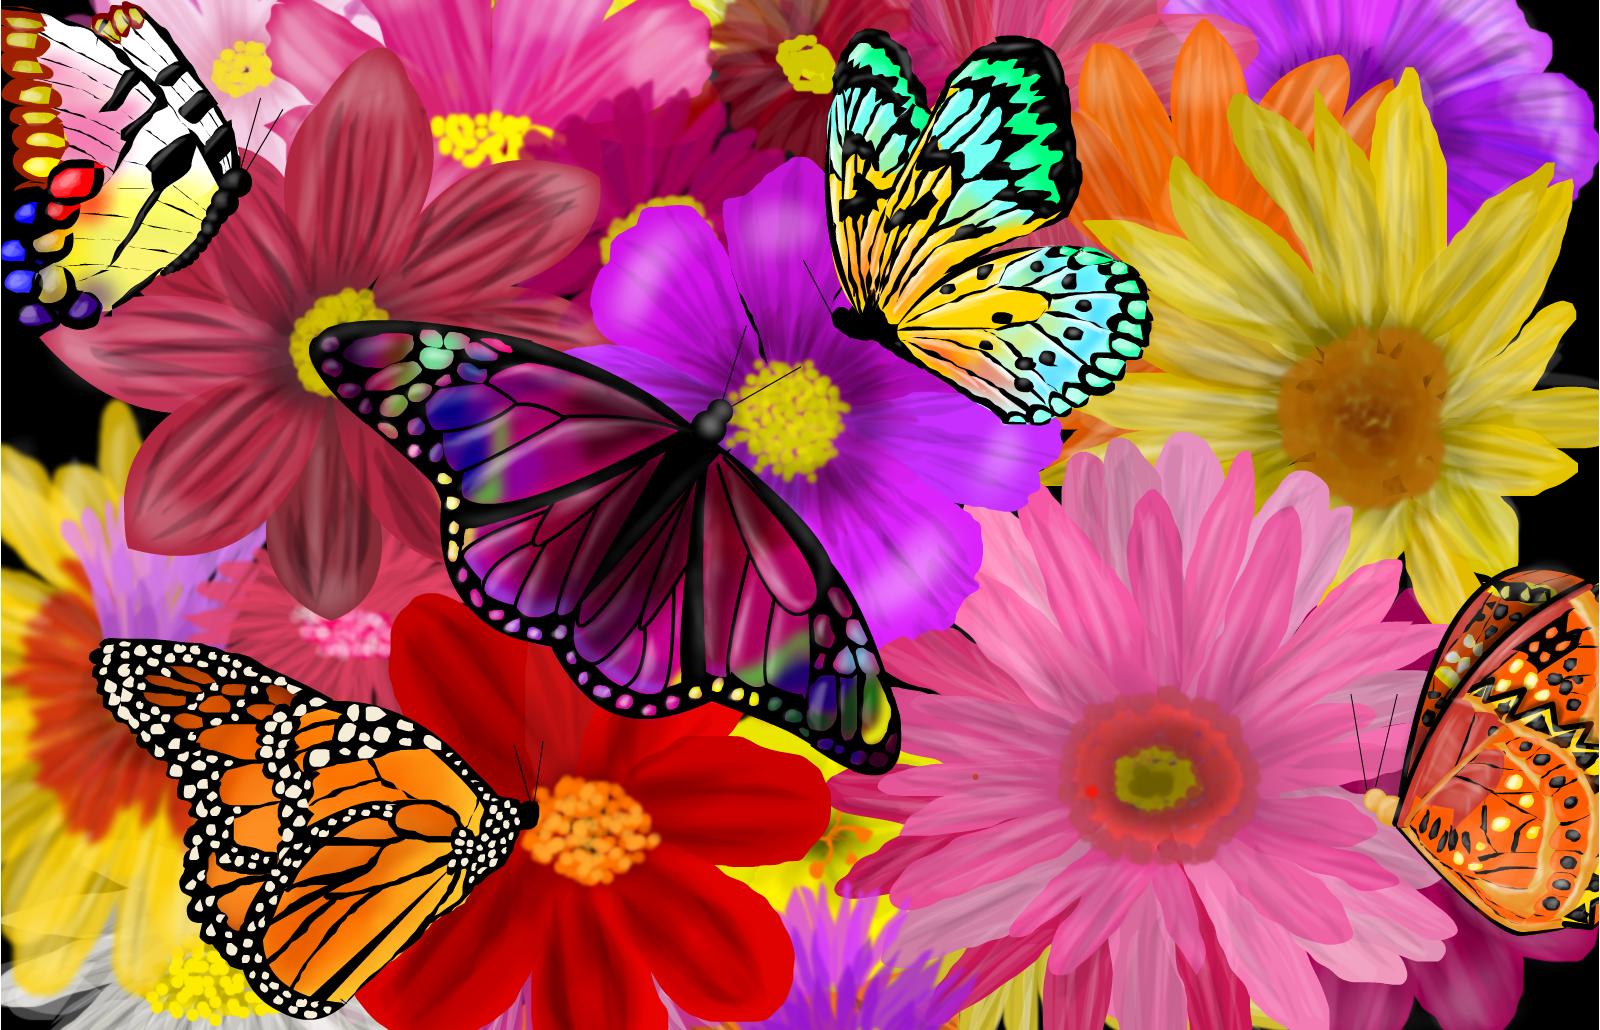 anxiety symptoms - butterflies